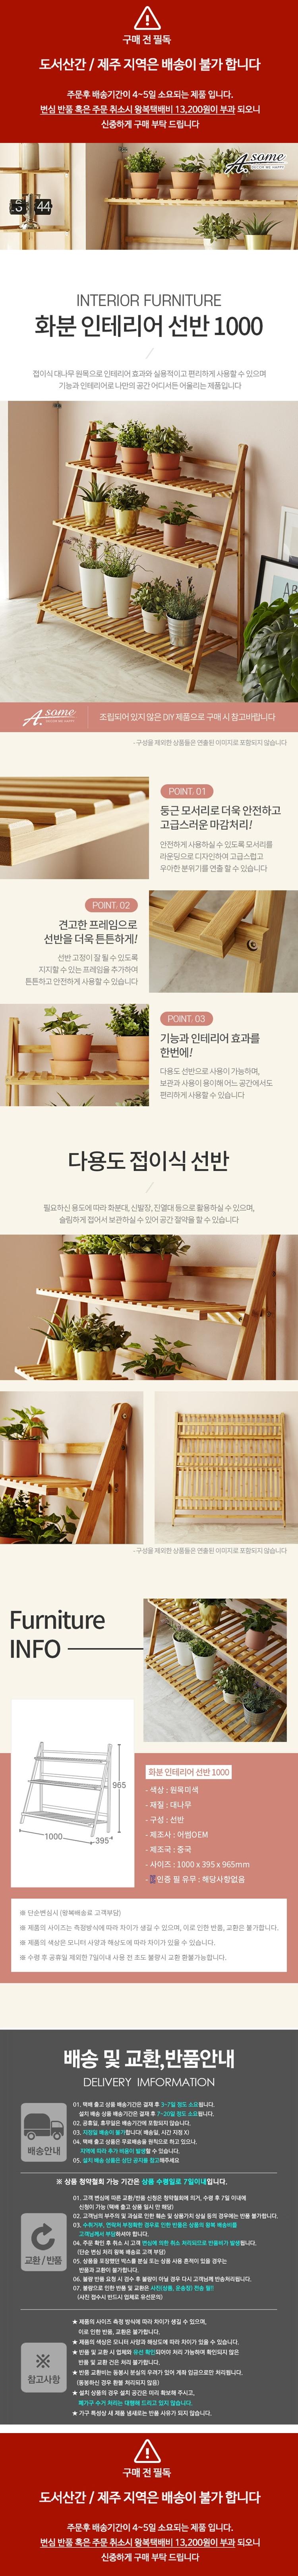 55_wood_flowerpot_1000_web.jpg